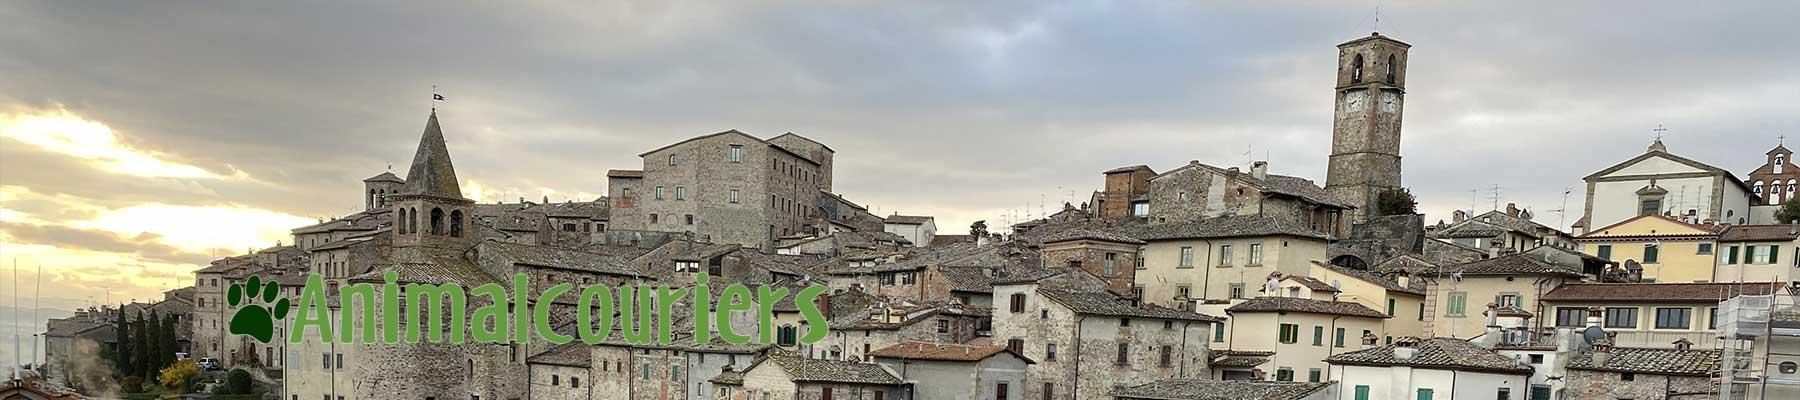 Italian rooftops